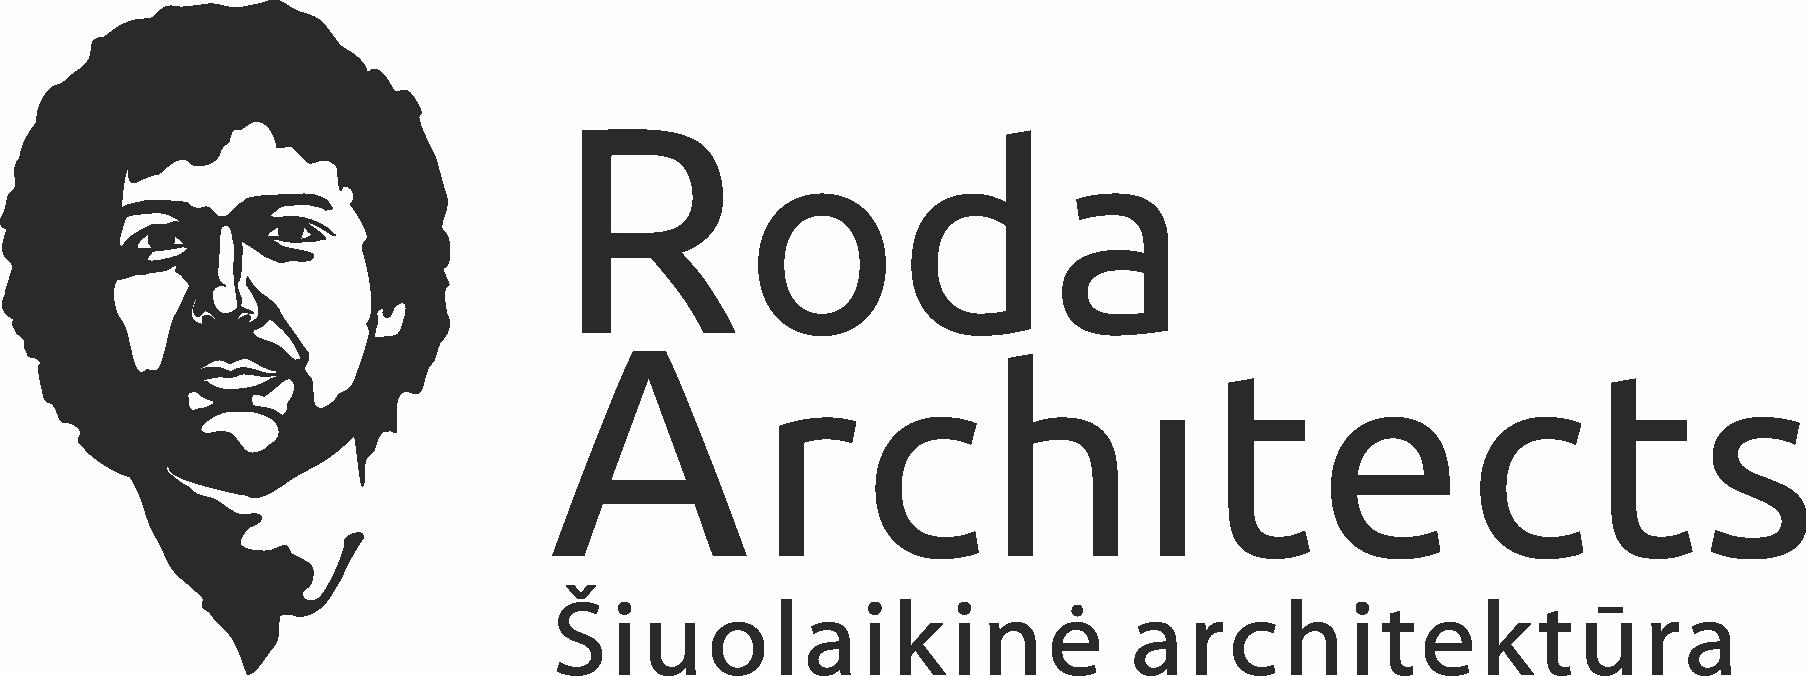 Architektūra